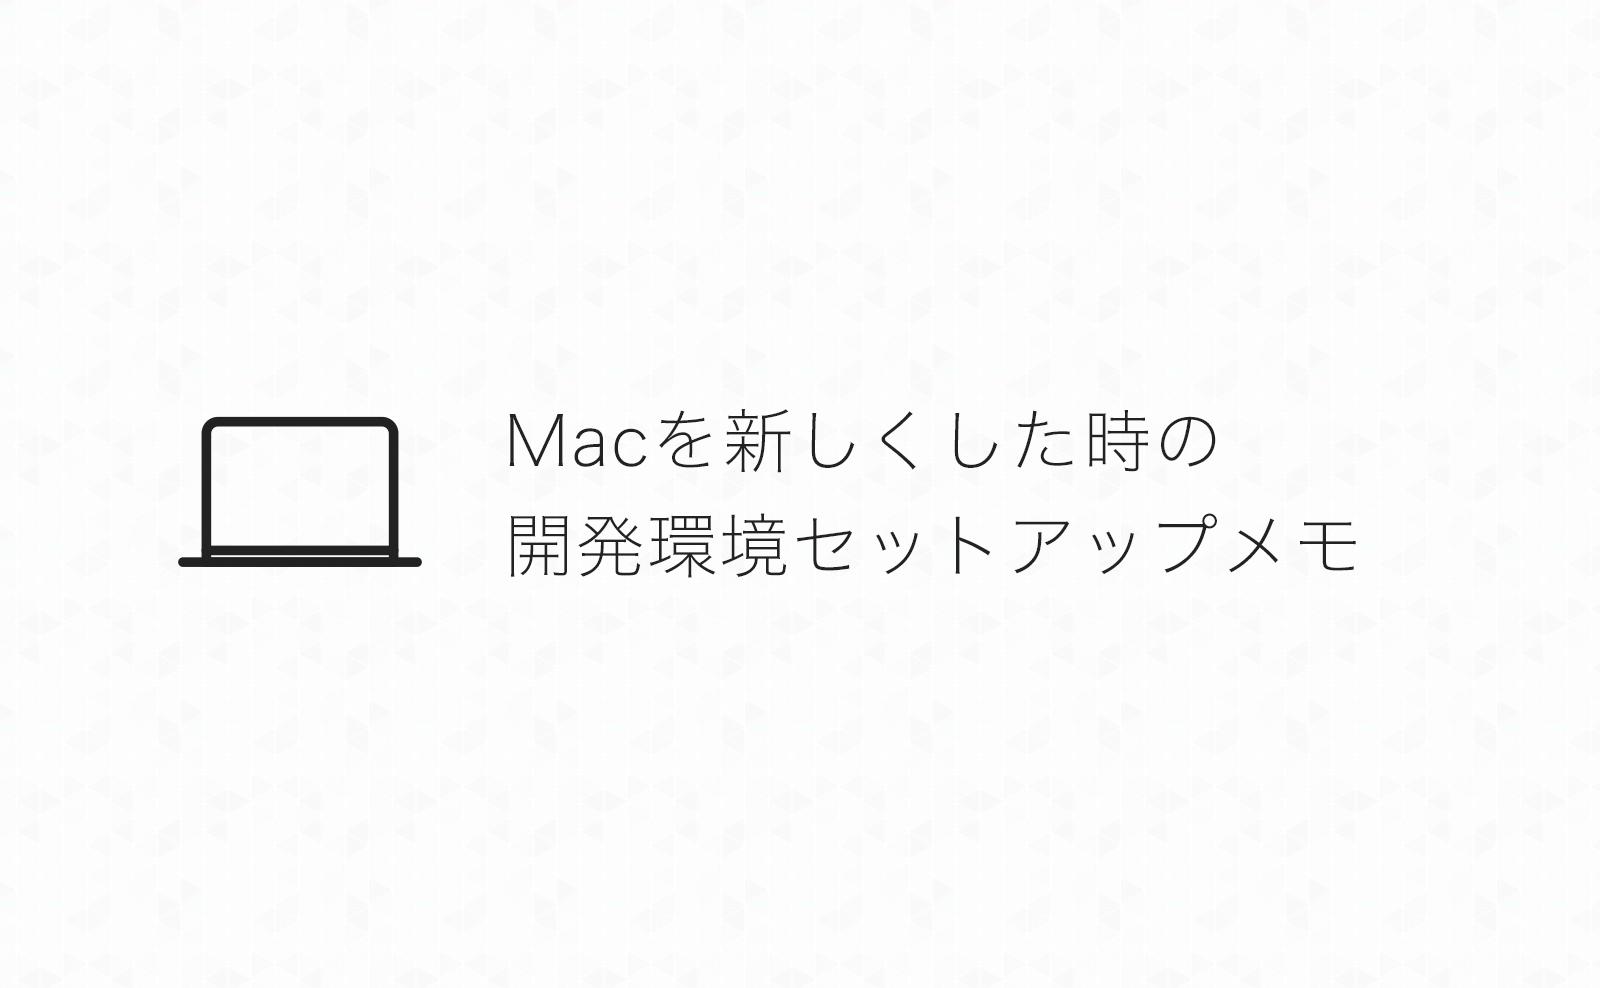 Macを新しくした時にインストールするアプリや開発環境セットアップメモ